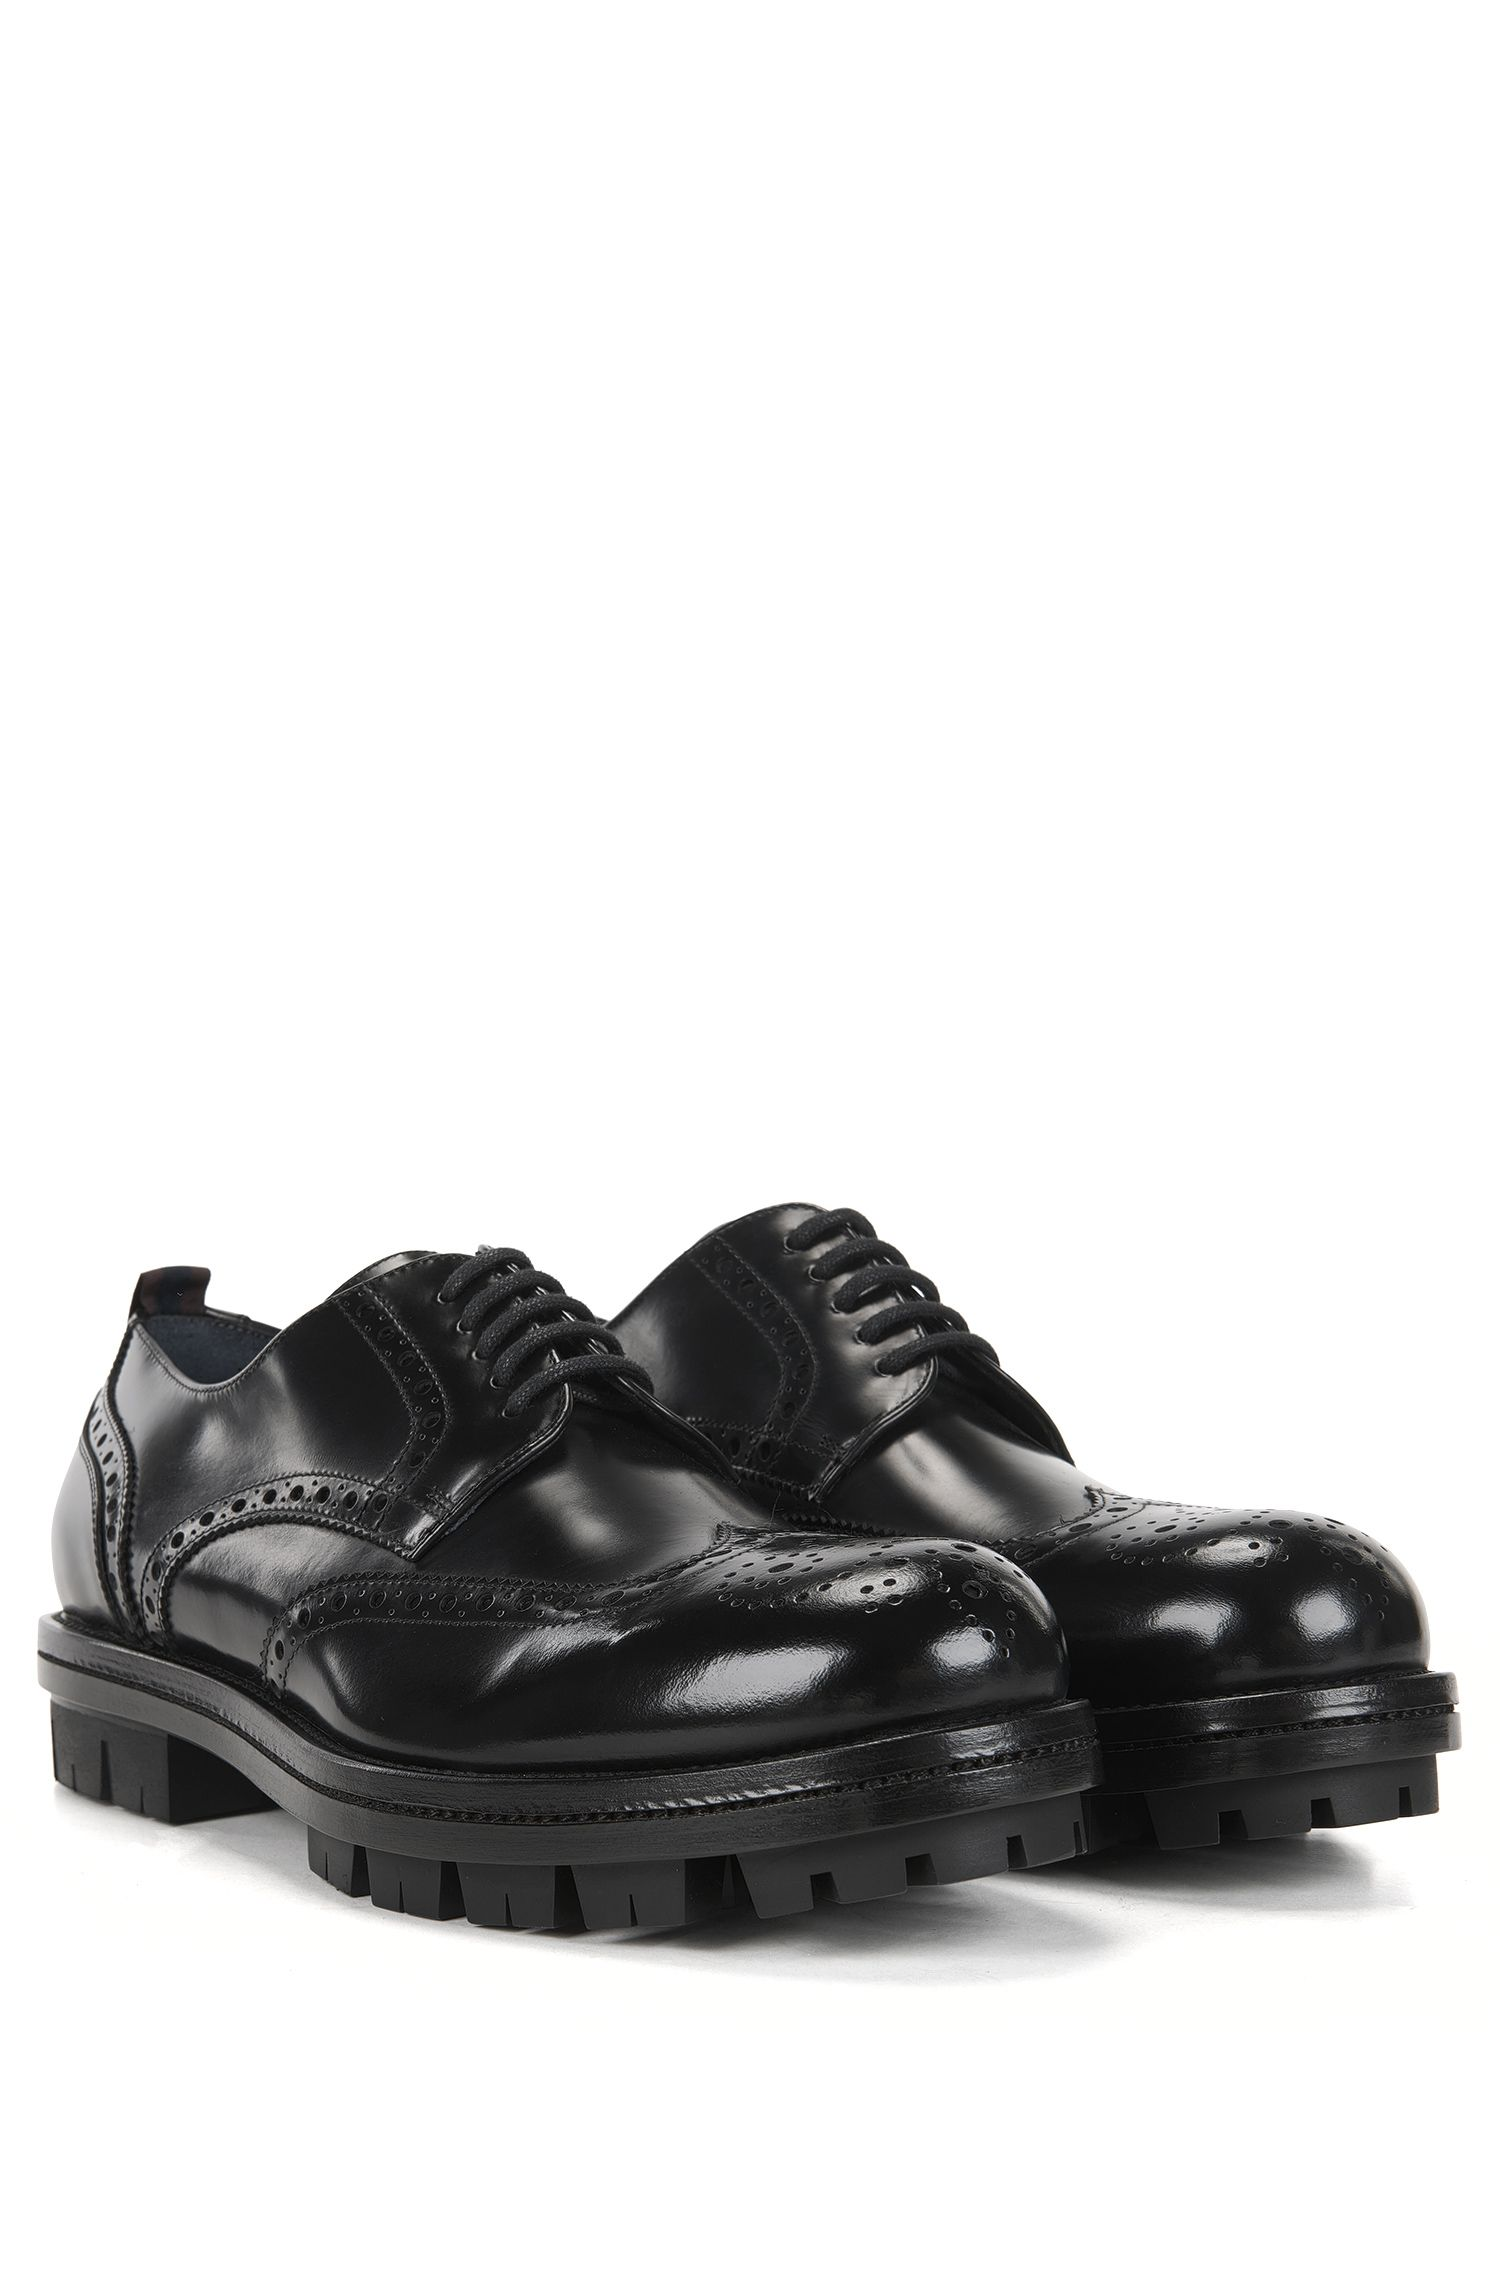 BOSS Hugo Boss Chunky Derby Shoe Twist Derb Wtb 10 Black